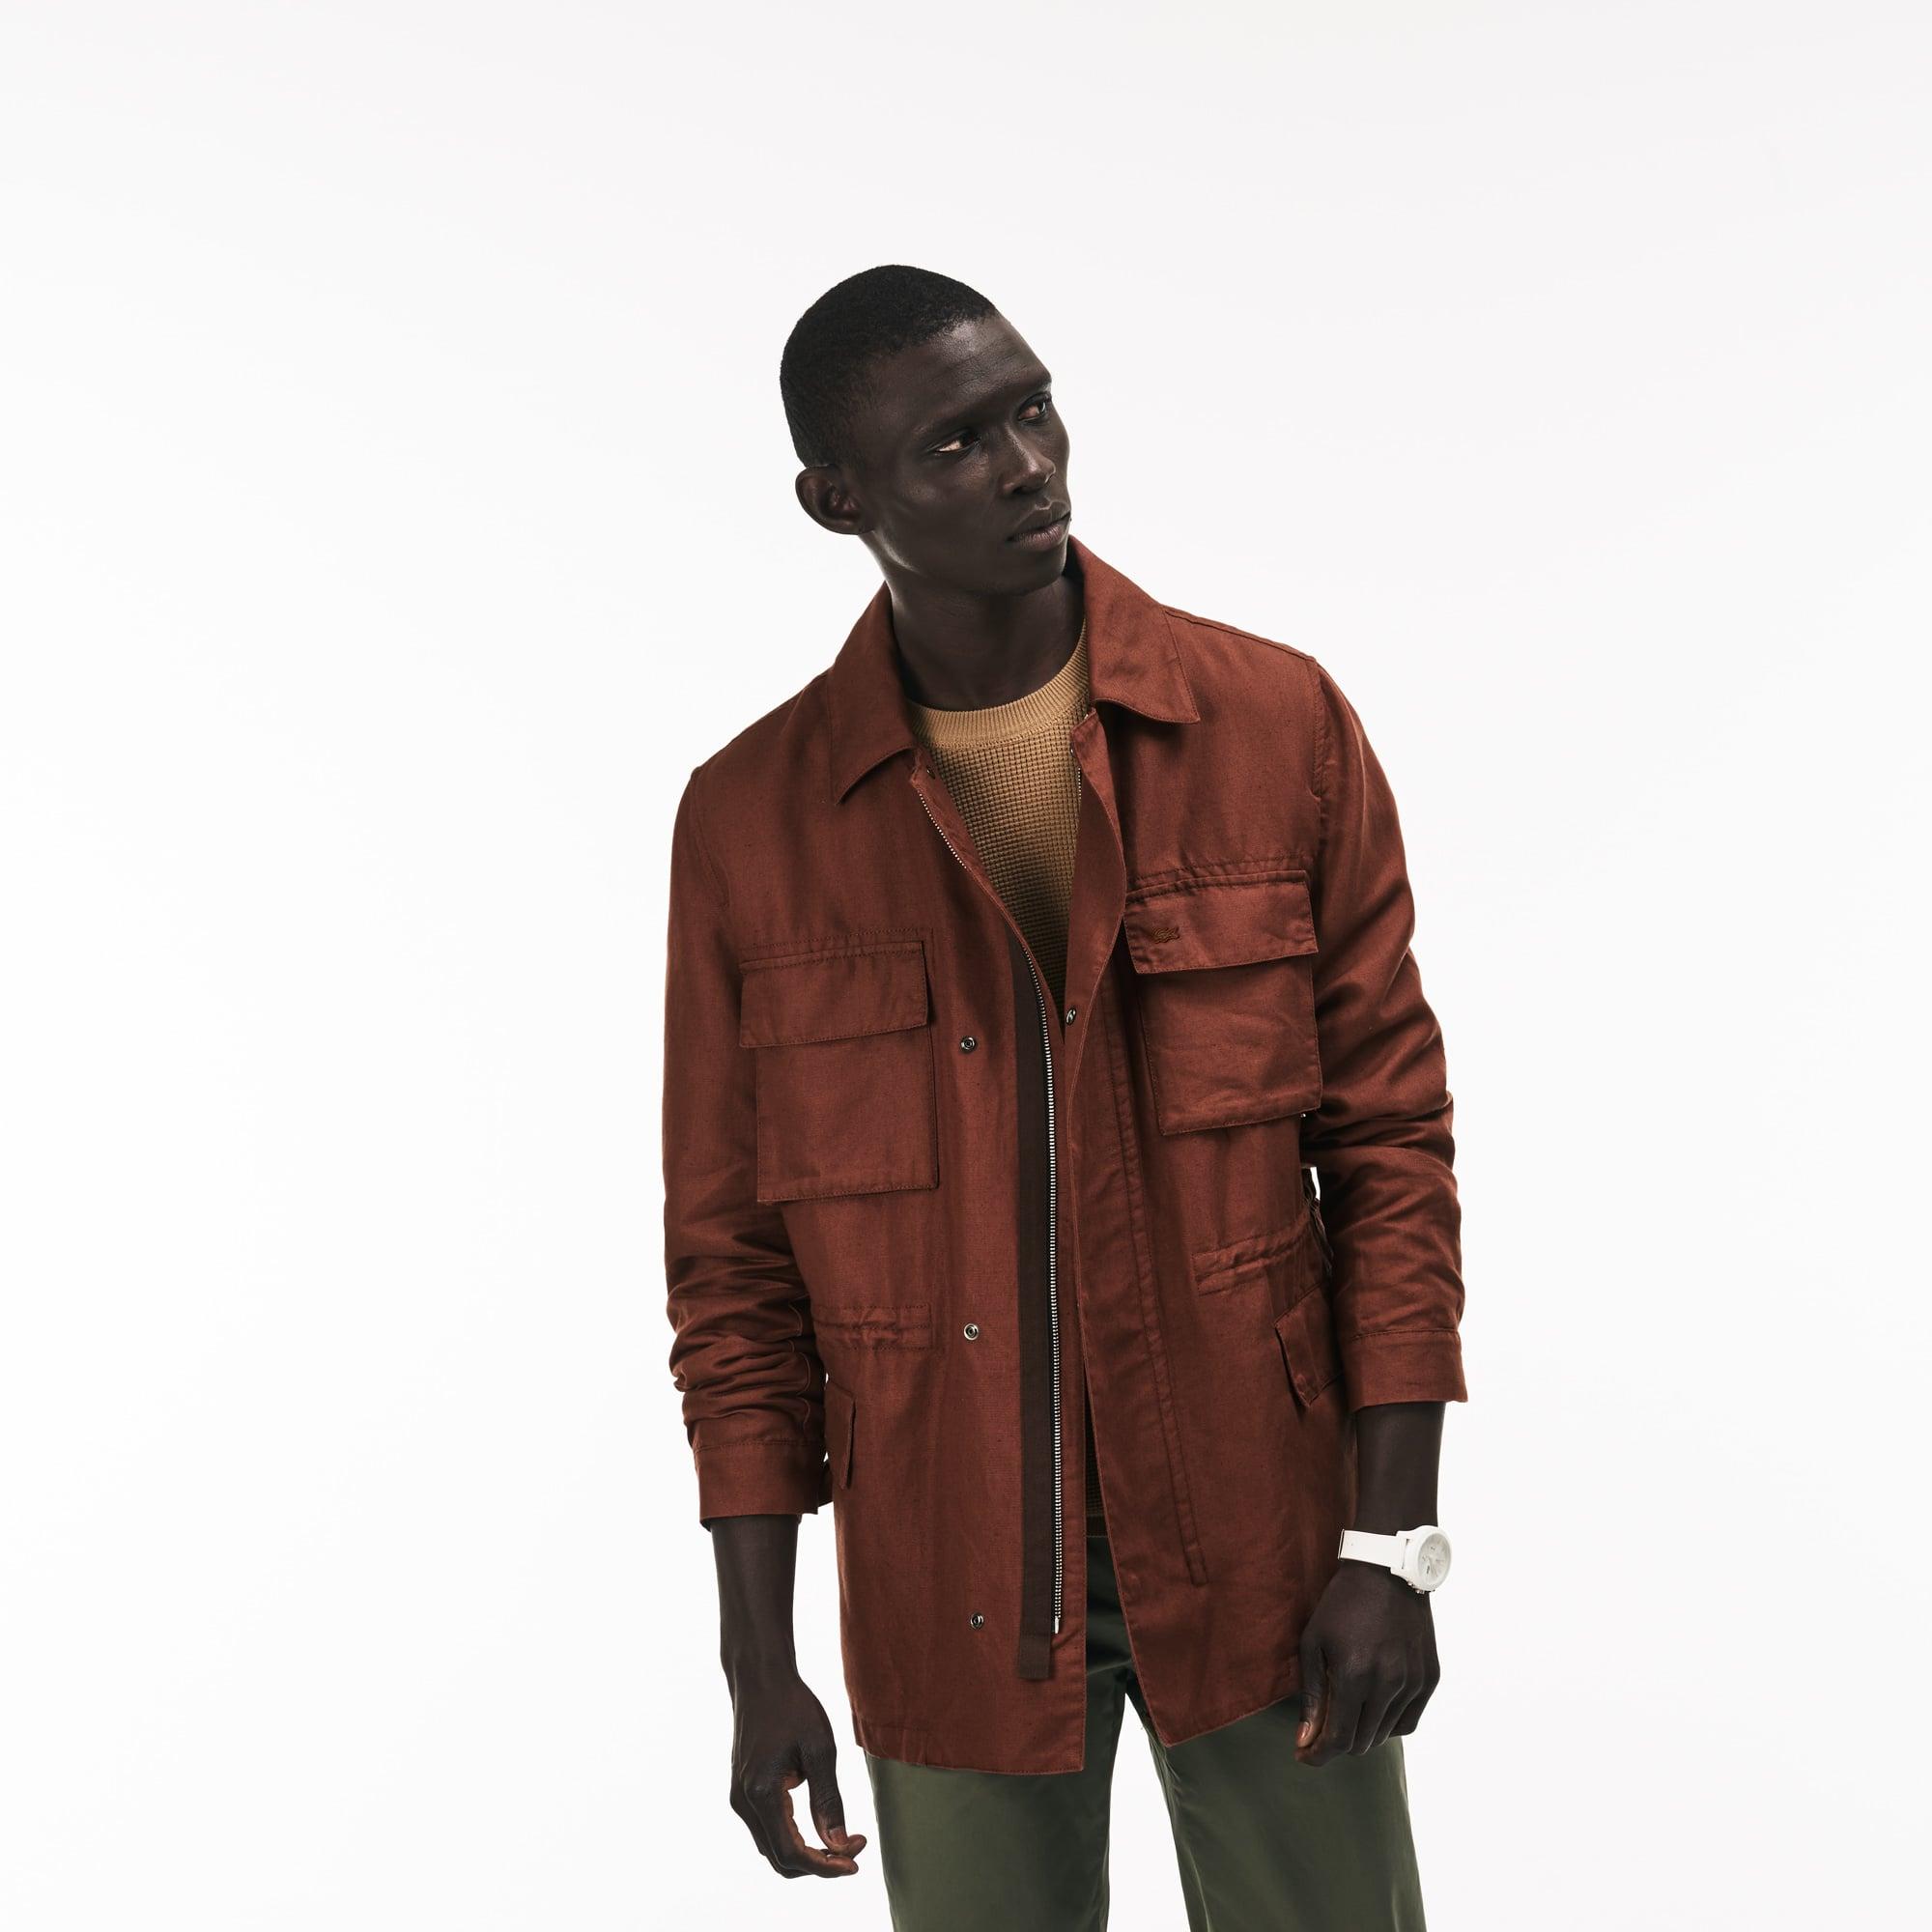 Men's Multi-Pocket Adjustable Canvas Jacket